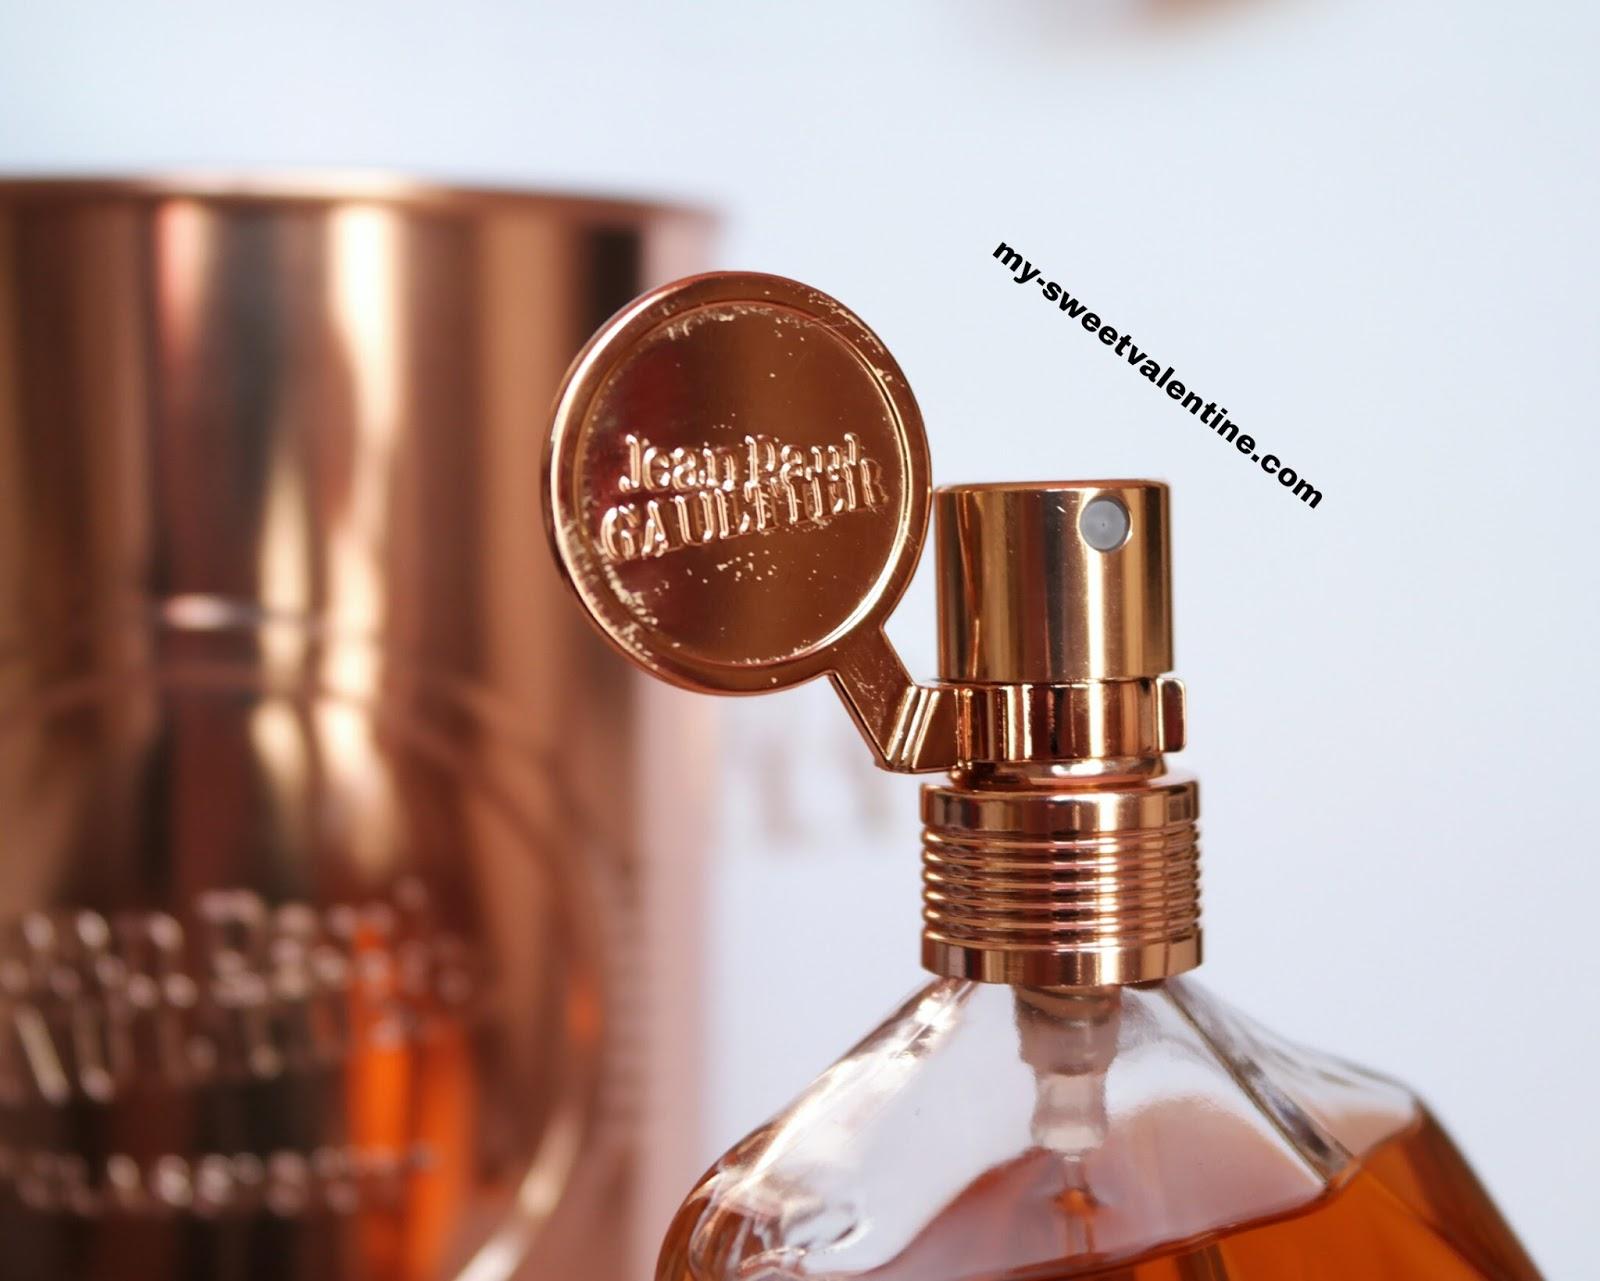 my sweet valentine jean paul gaultier essence de parfum. Black Bedroom Furniture Sets. Home Design Ideas